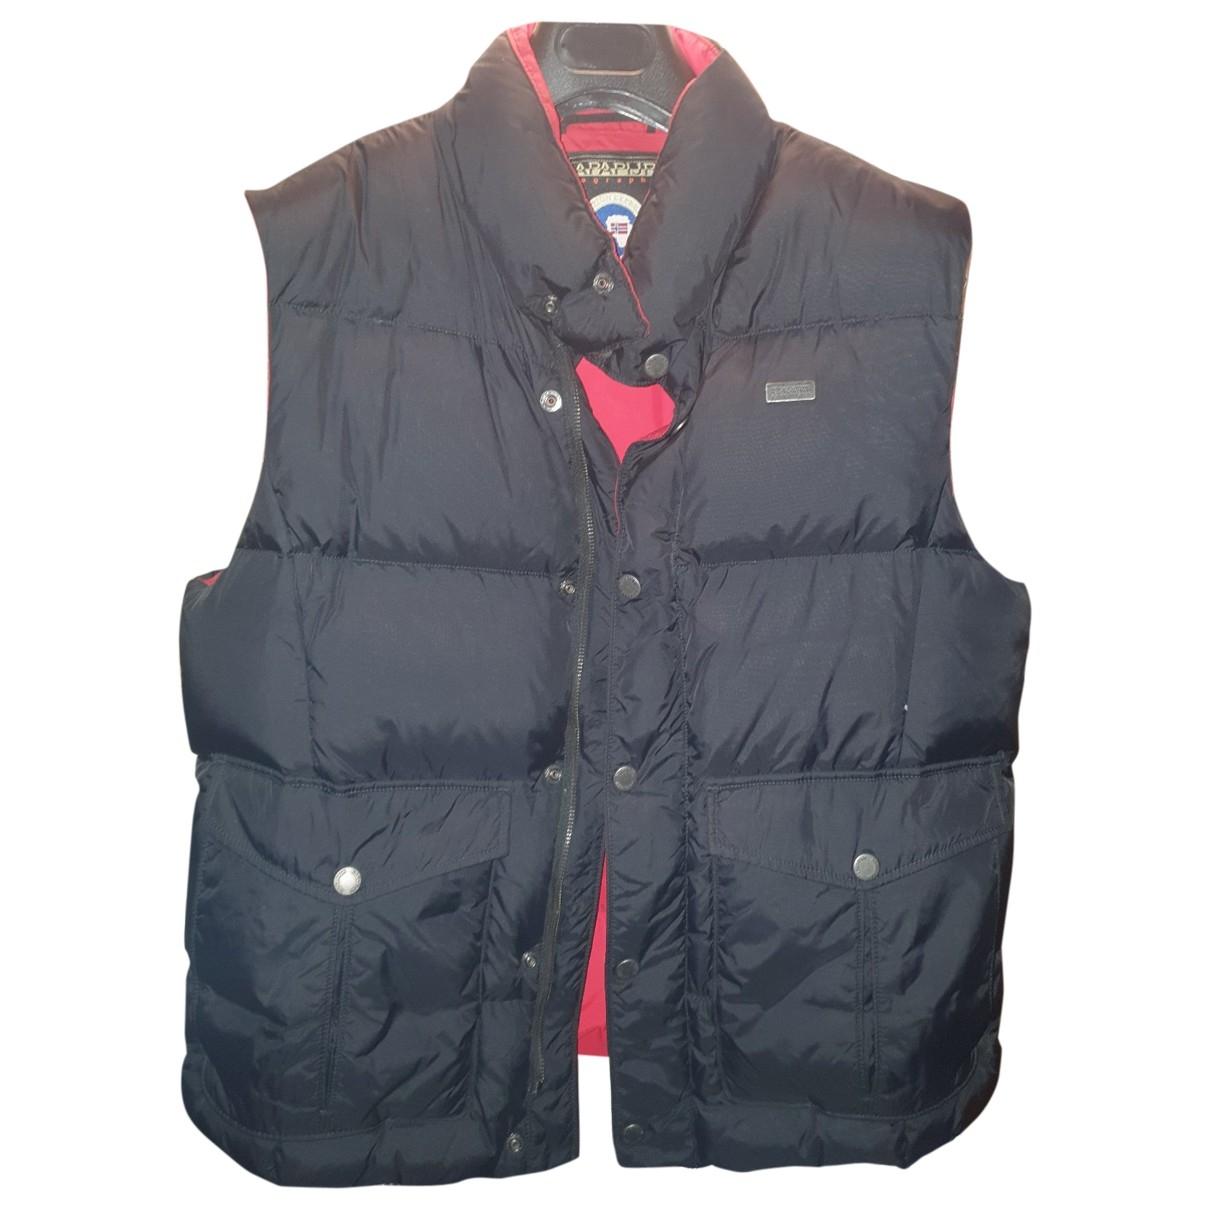 Napapijri \N Black jacket  for Men XL International